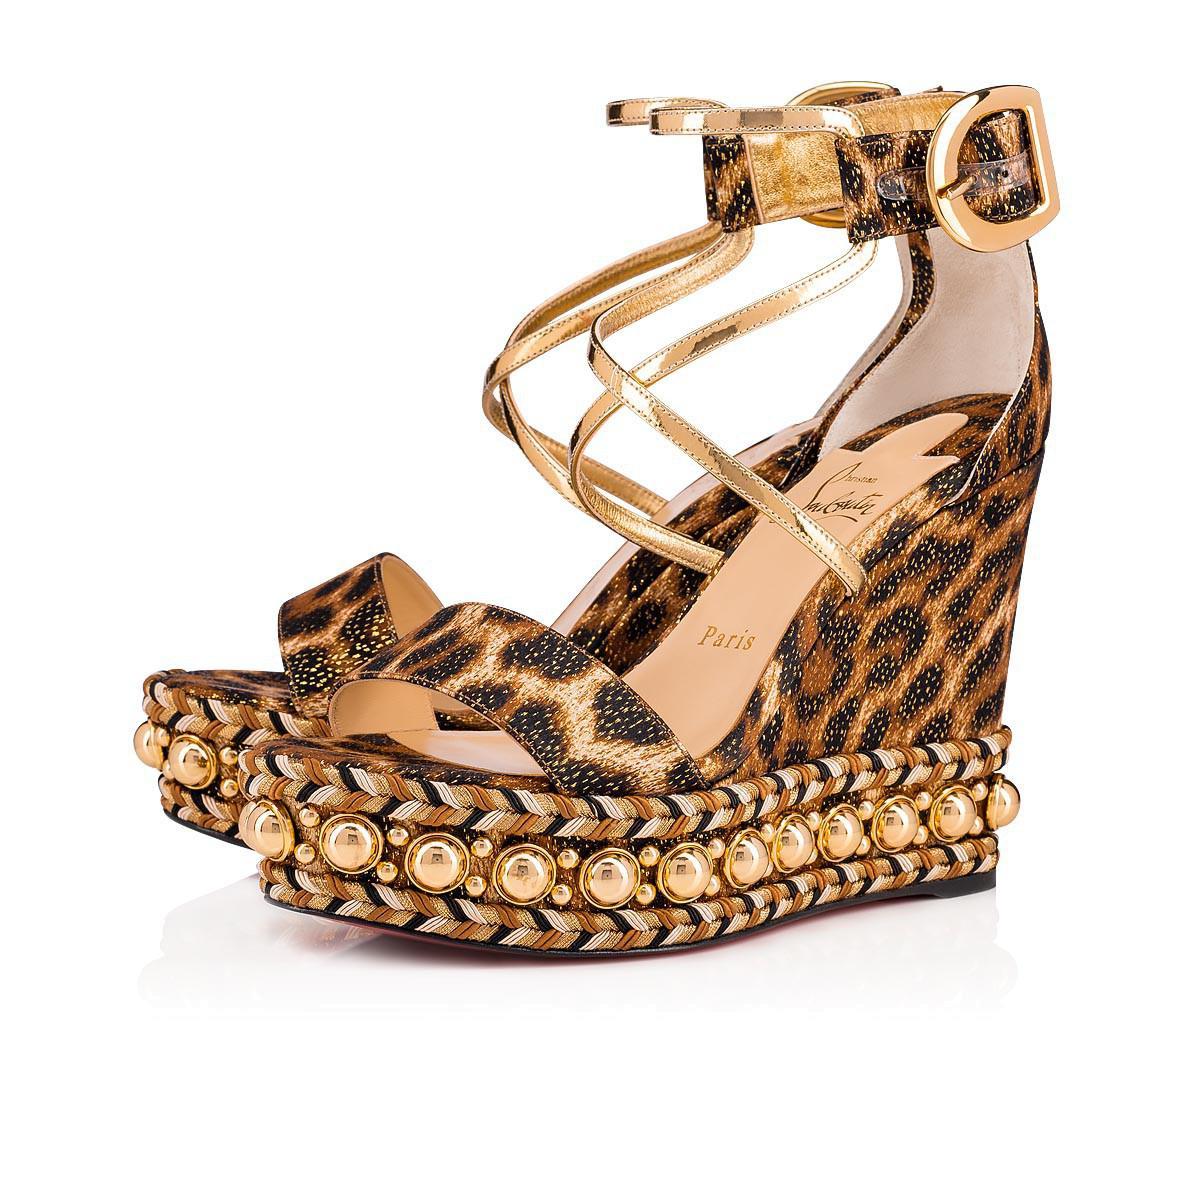 99af72eb2db Christian Louboutin. Women s Metallic Chocazeppa 120 Leopard Lurex Platform  Wedge Sandals